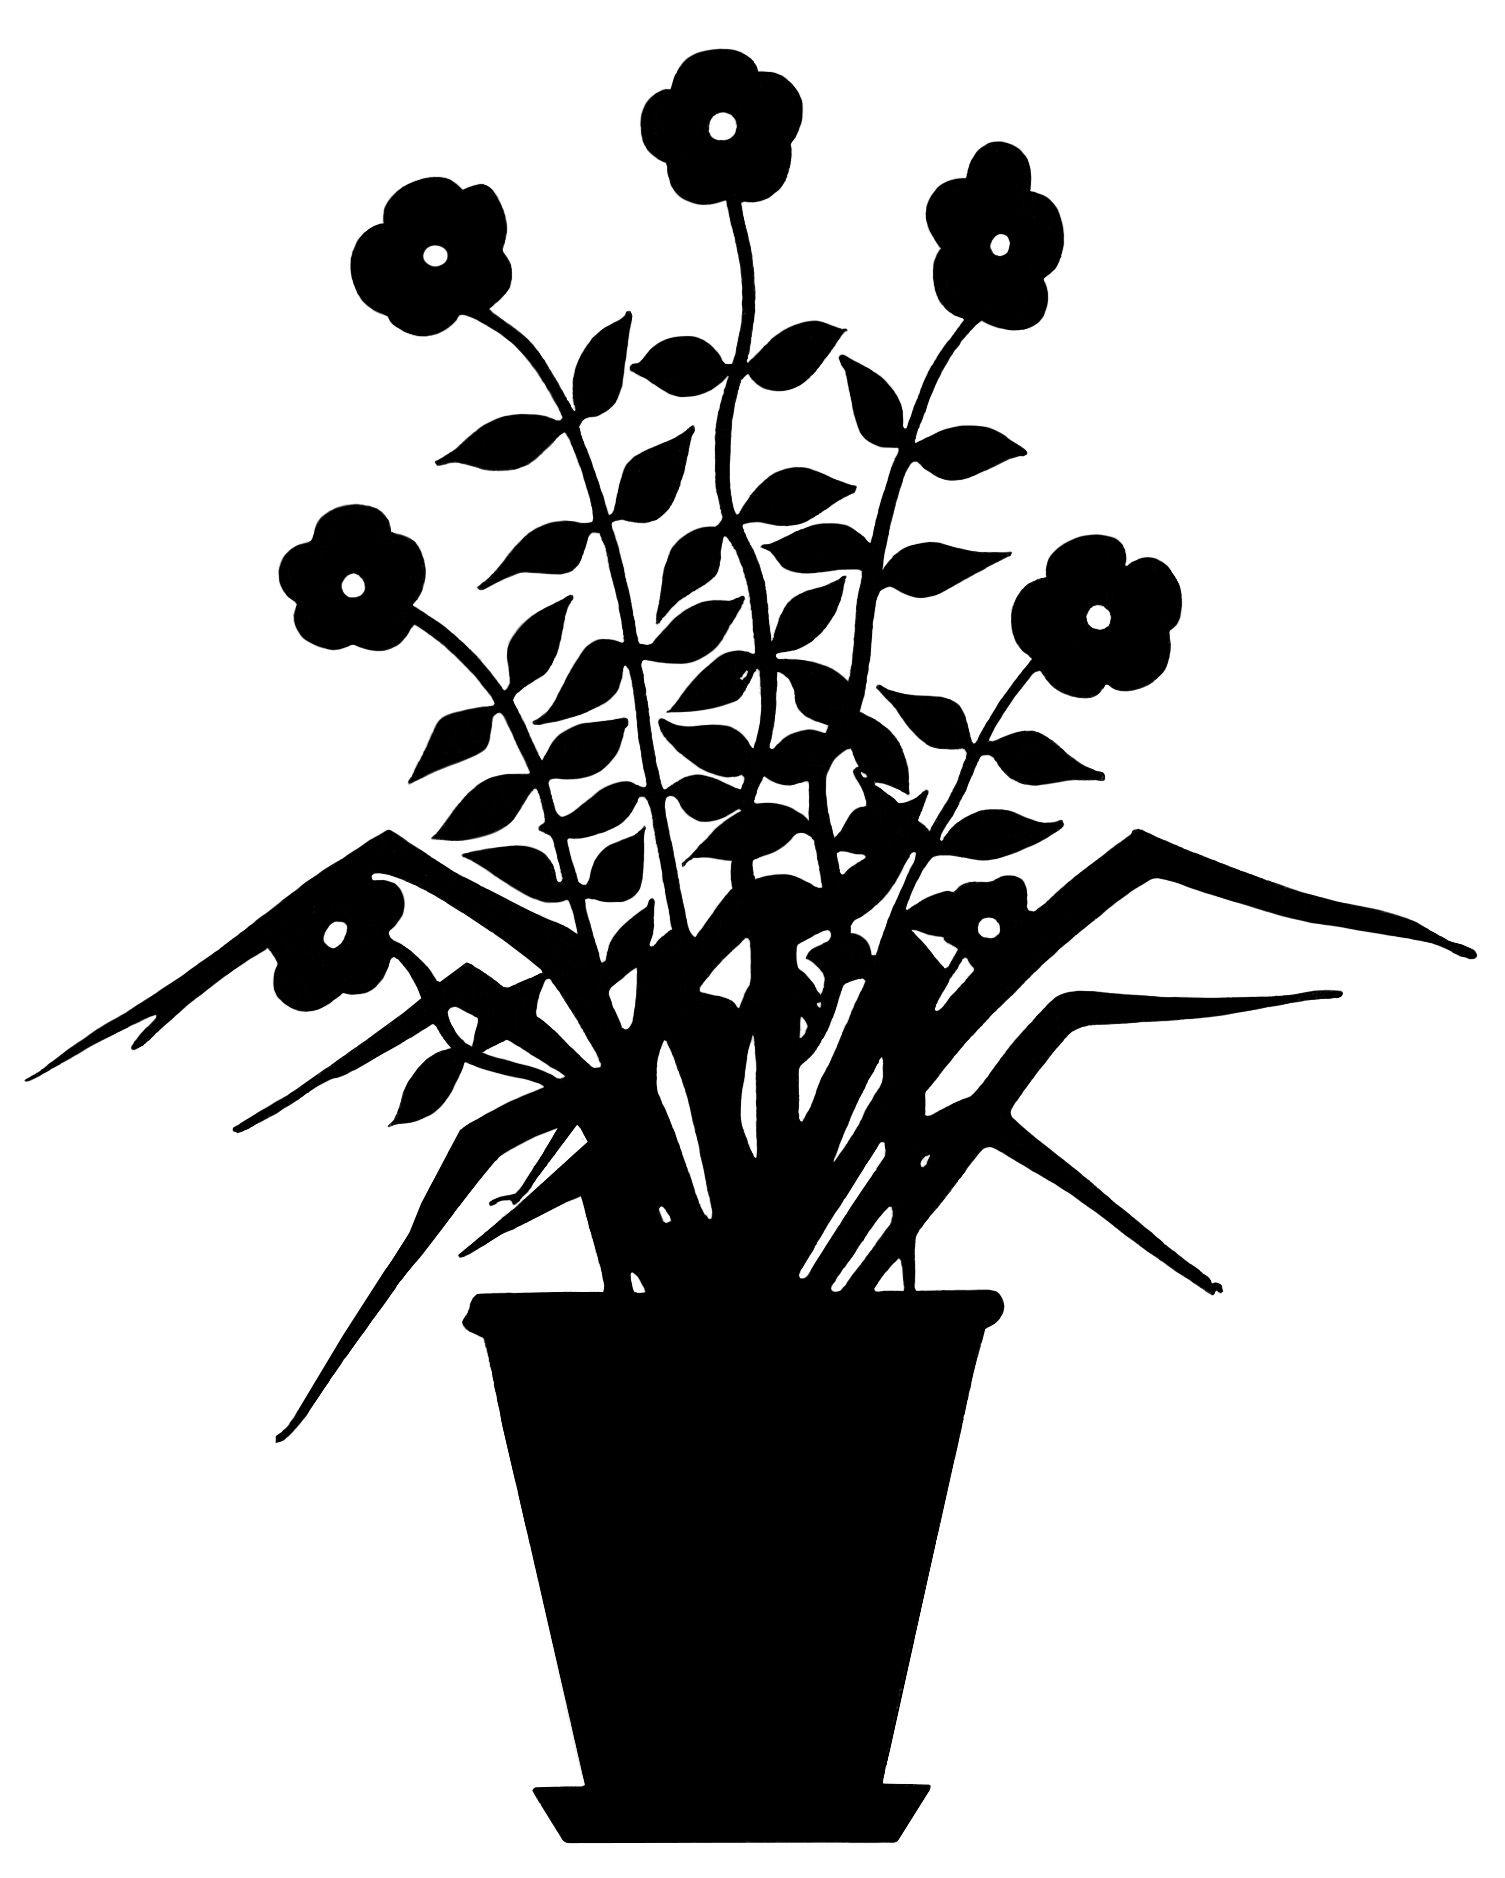 vintage flower clip art flowering plant silhouette black and white